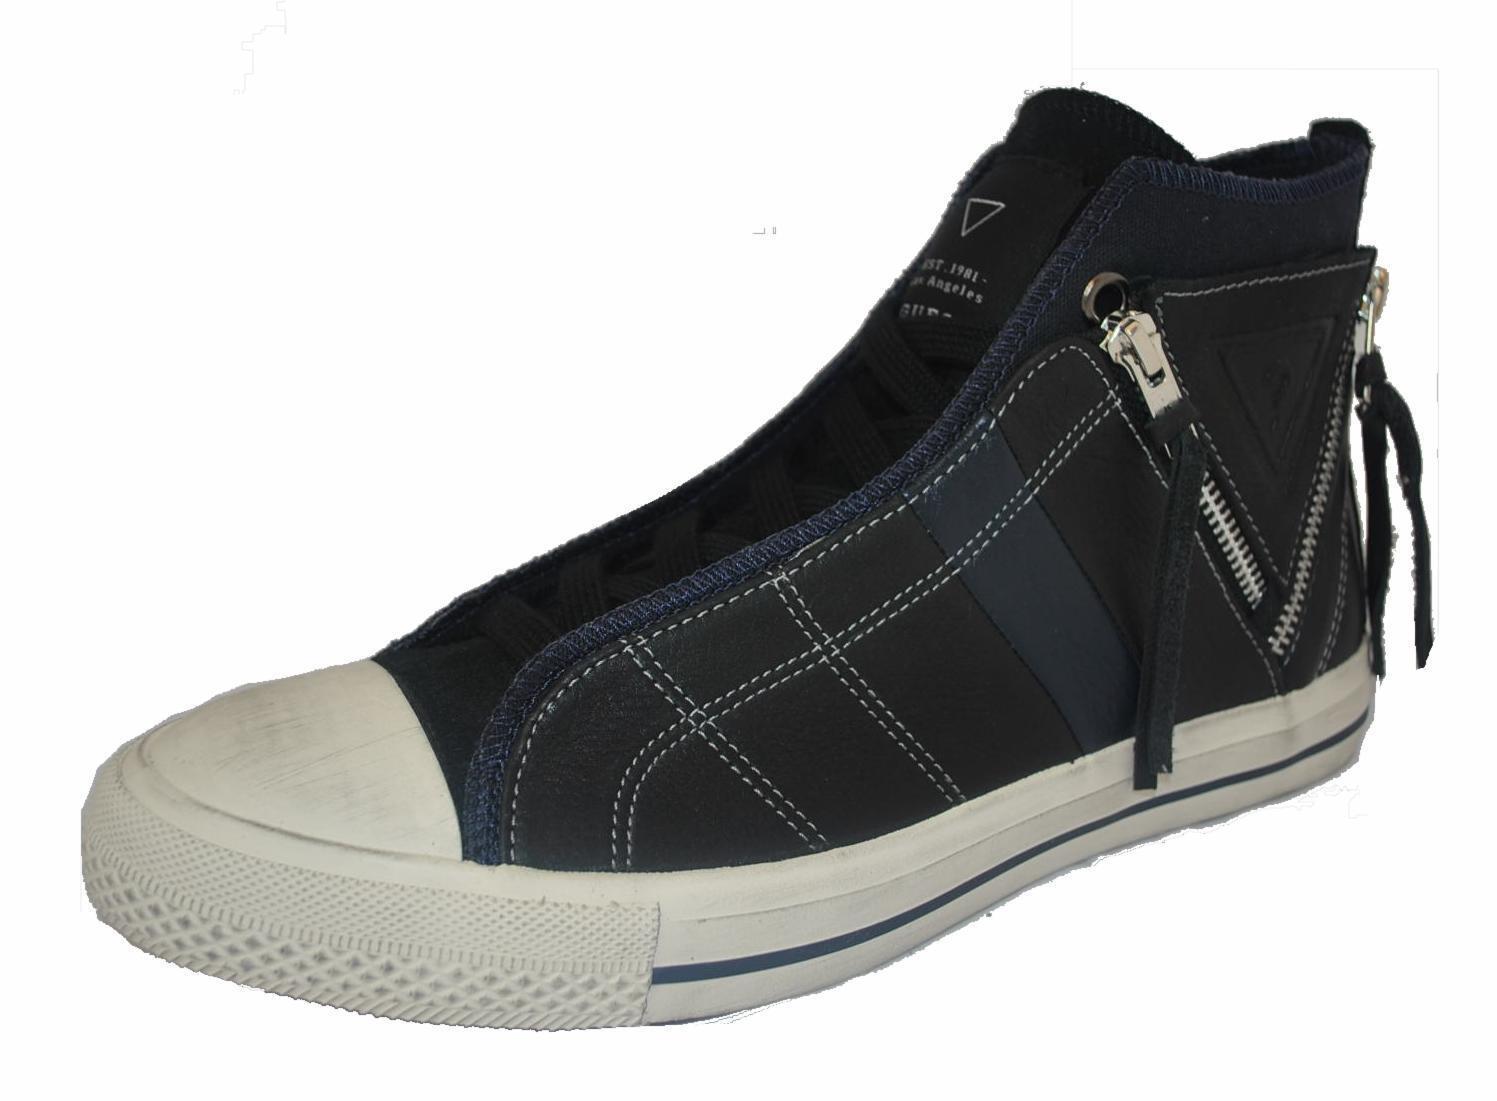 GUESS BREAK Herren,Men,Turnschuhe High,Schuhe,Navy-Schwarz-Weiß,NEU,Leder, ,    | Abrechnungspreis